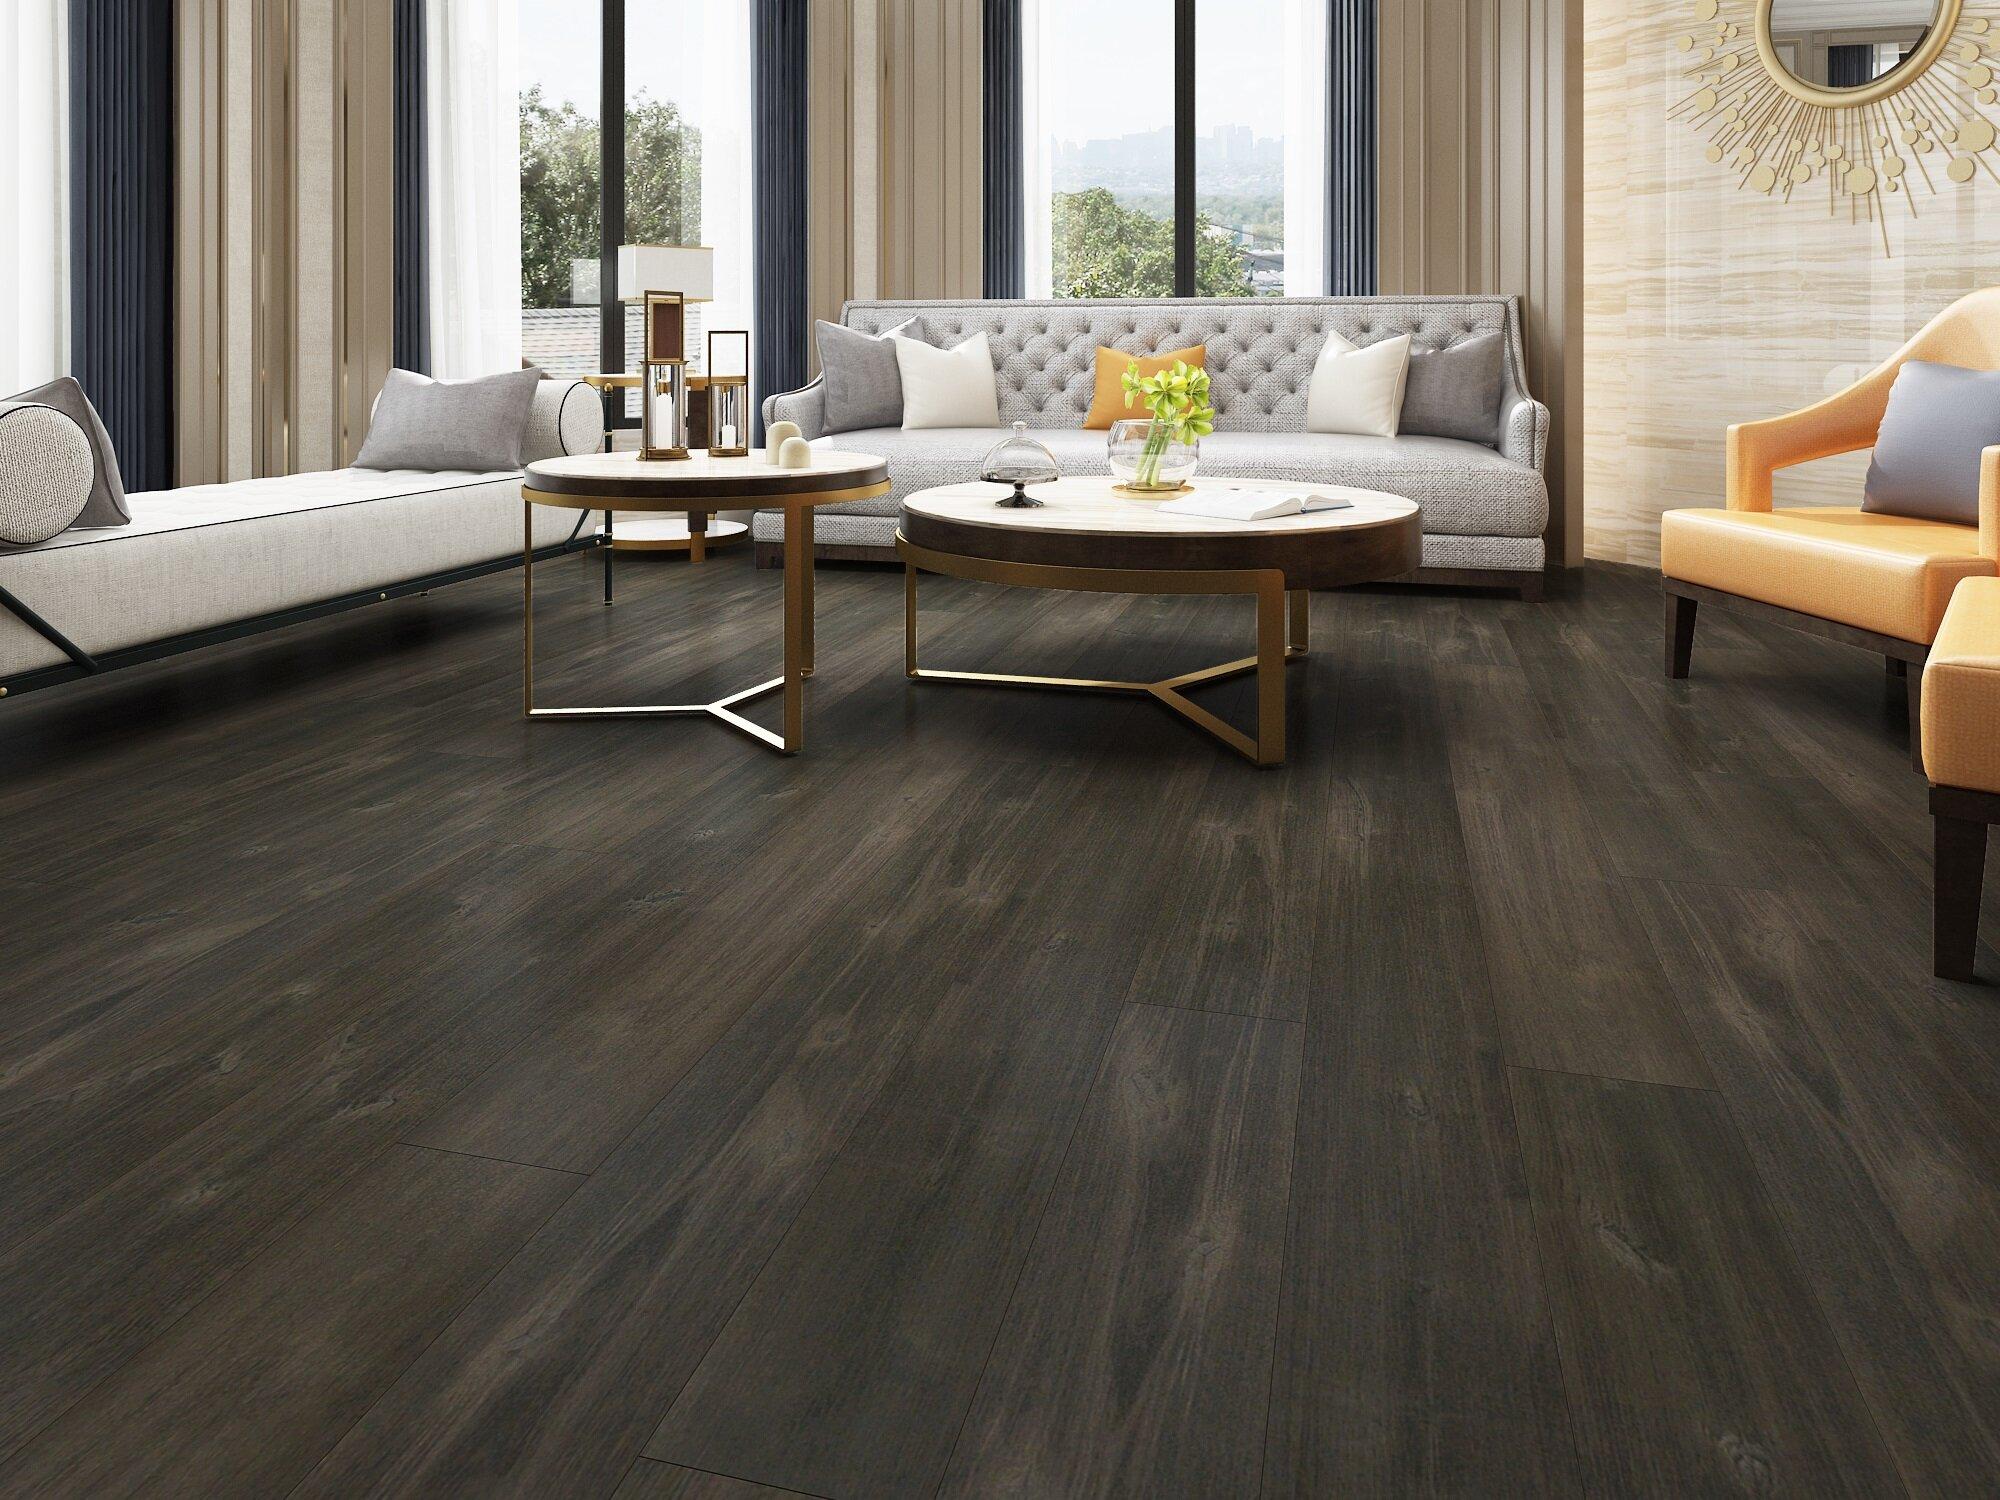 "Birch 8/8"" Thick x 8-8/8"" Wide x 85"" Length Pewter Finish Engineered  Hardwood Flooring"